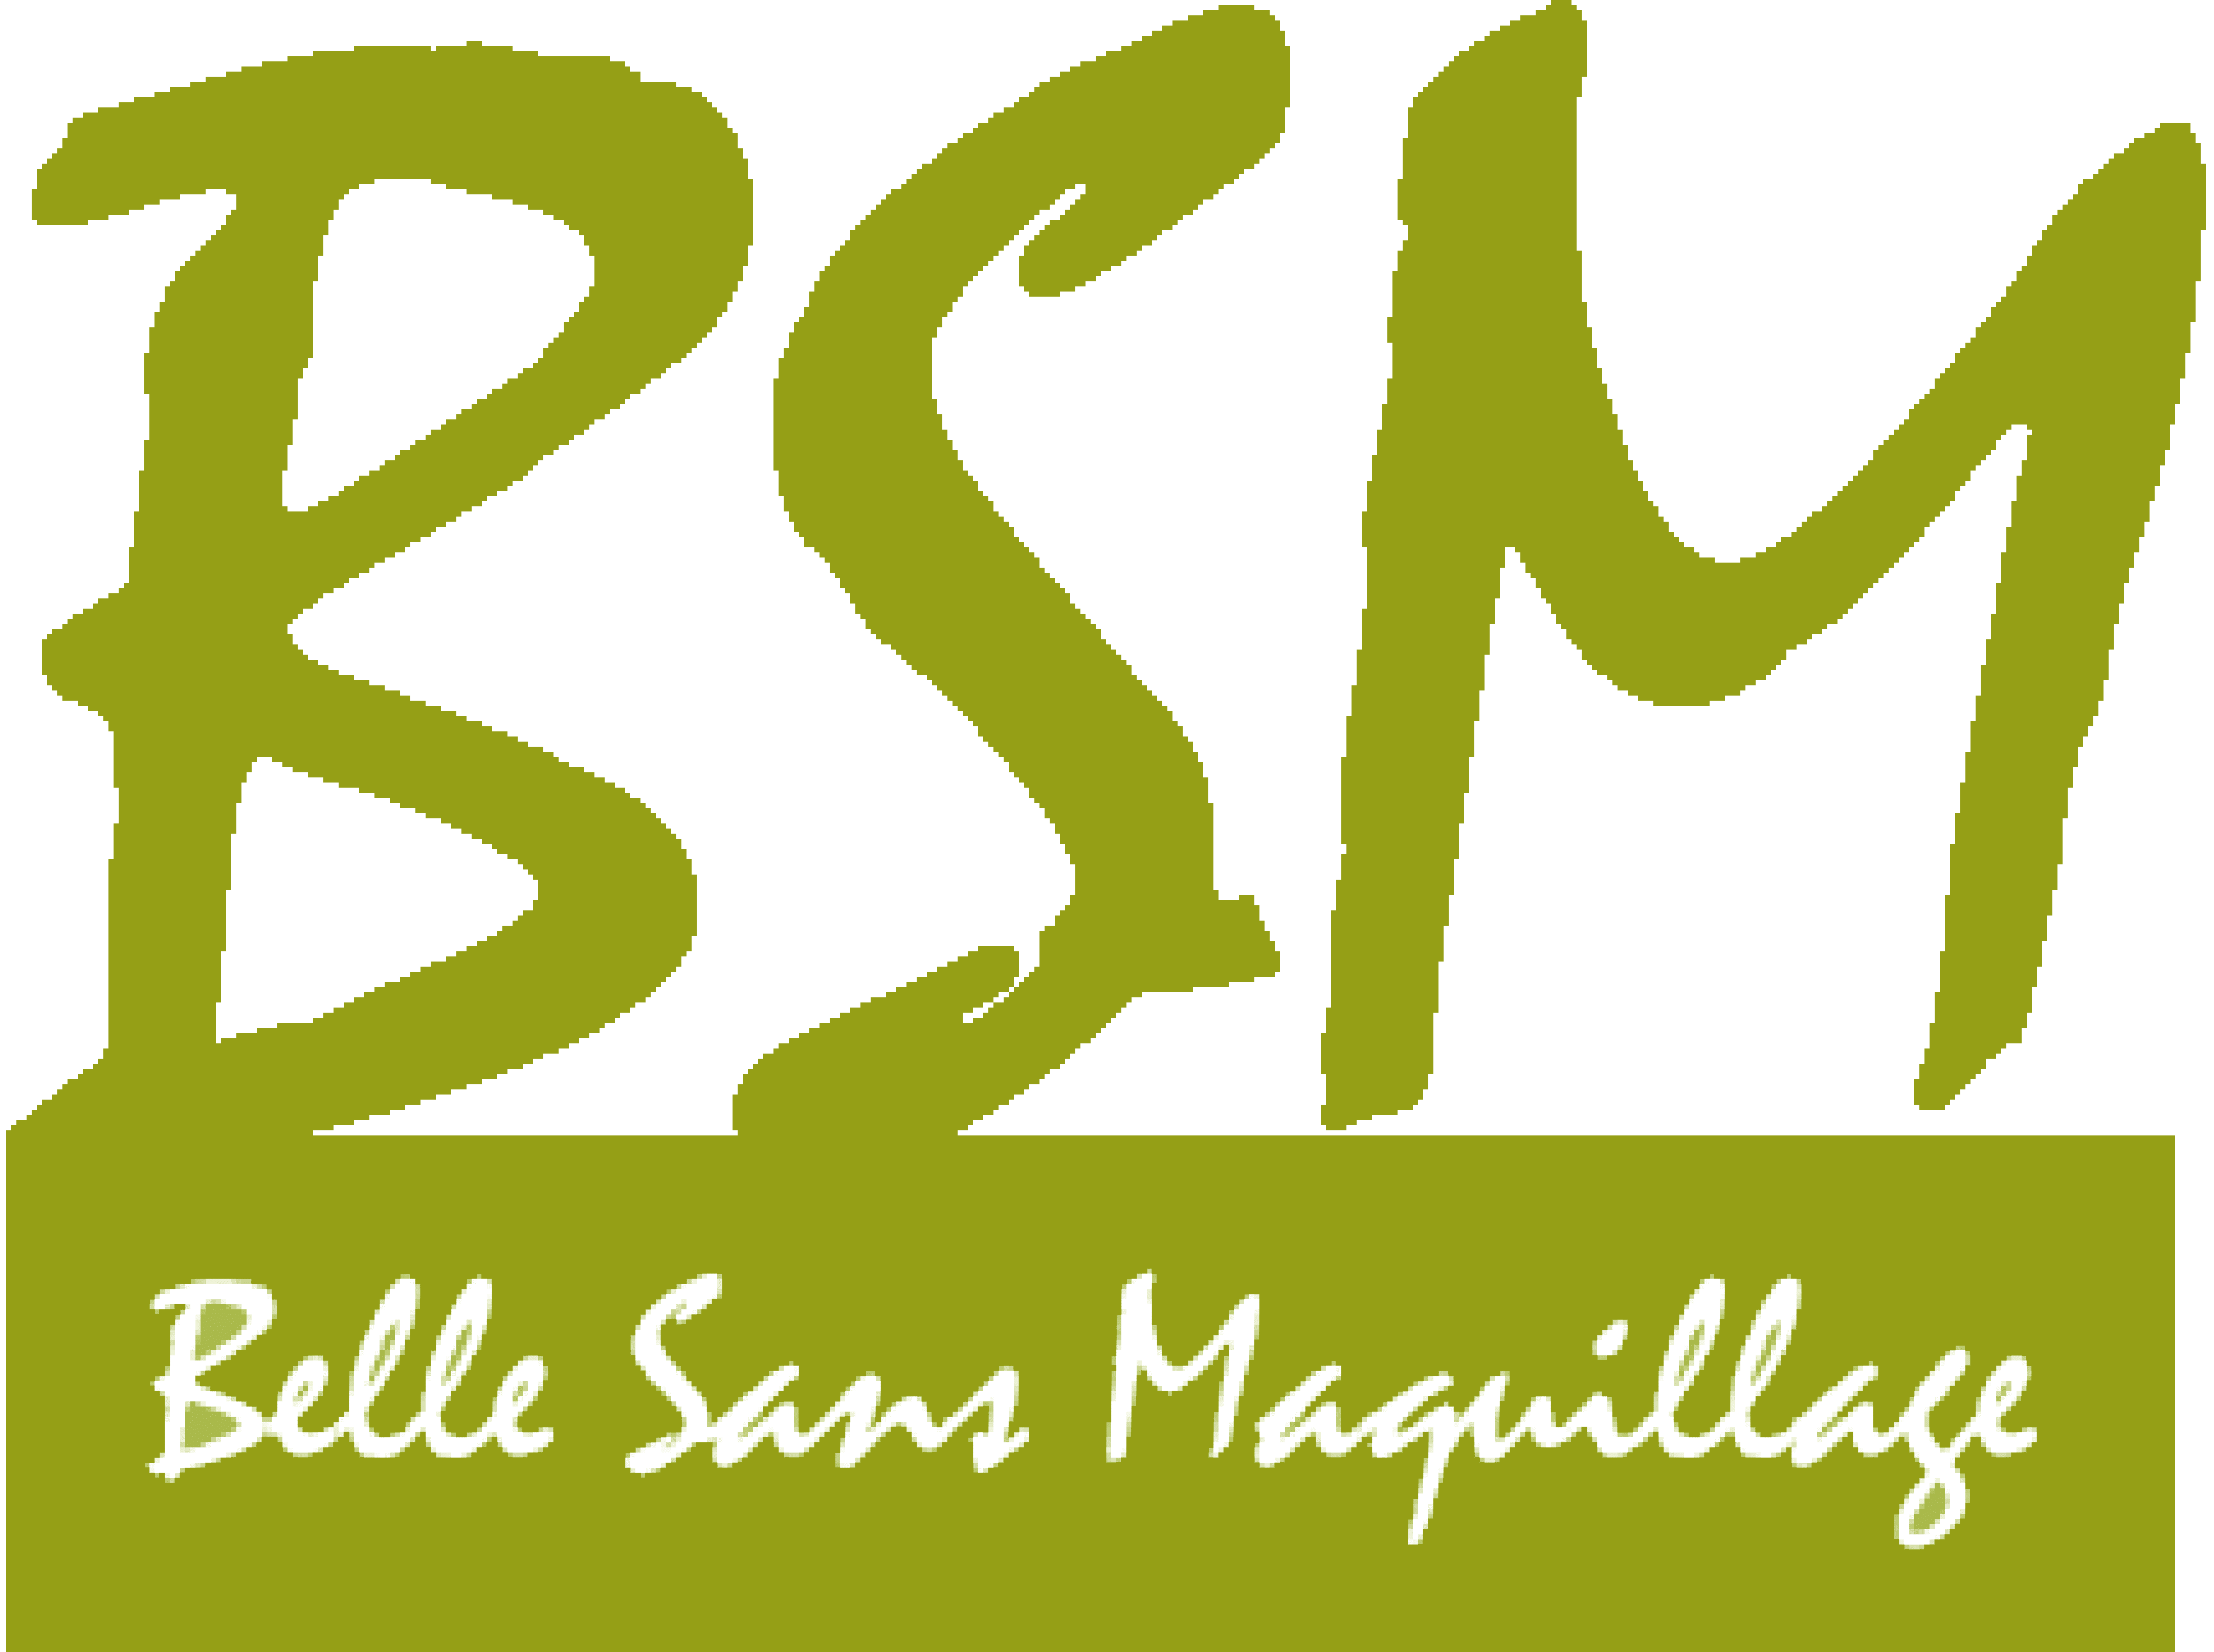 Logo Belle sans Maquillage